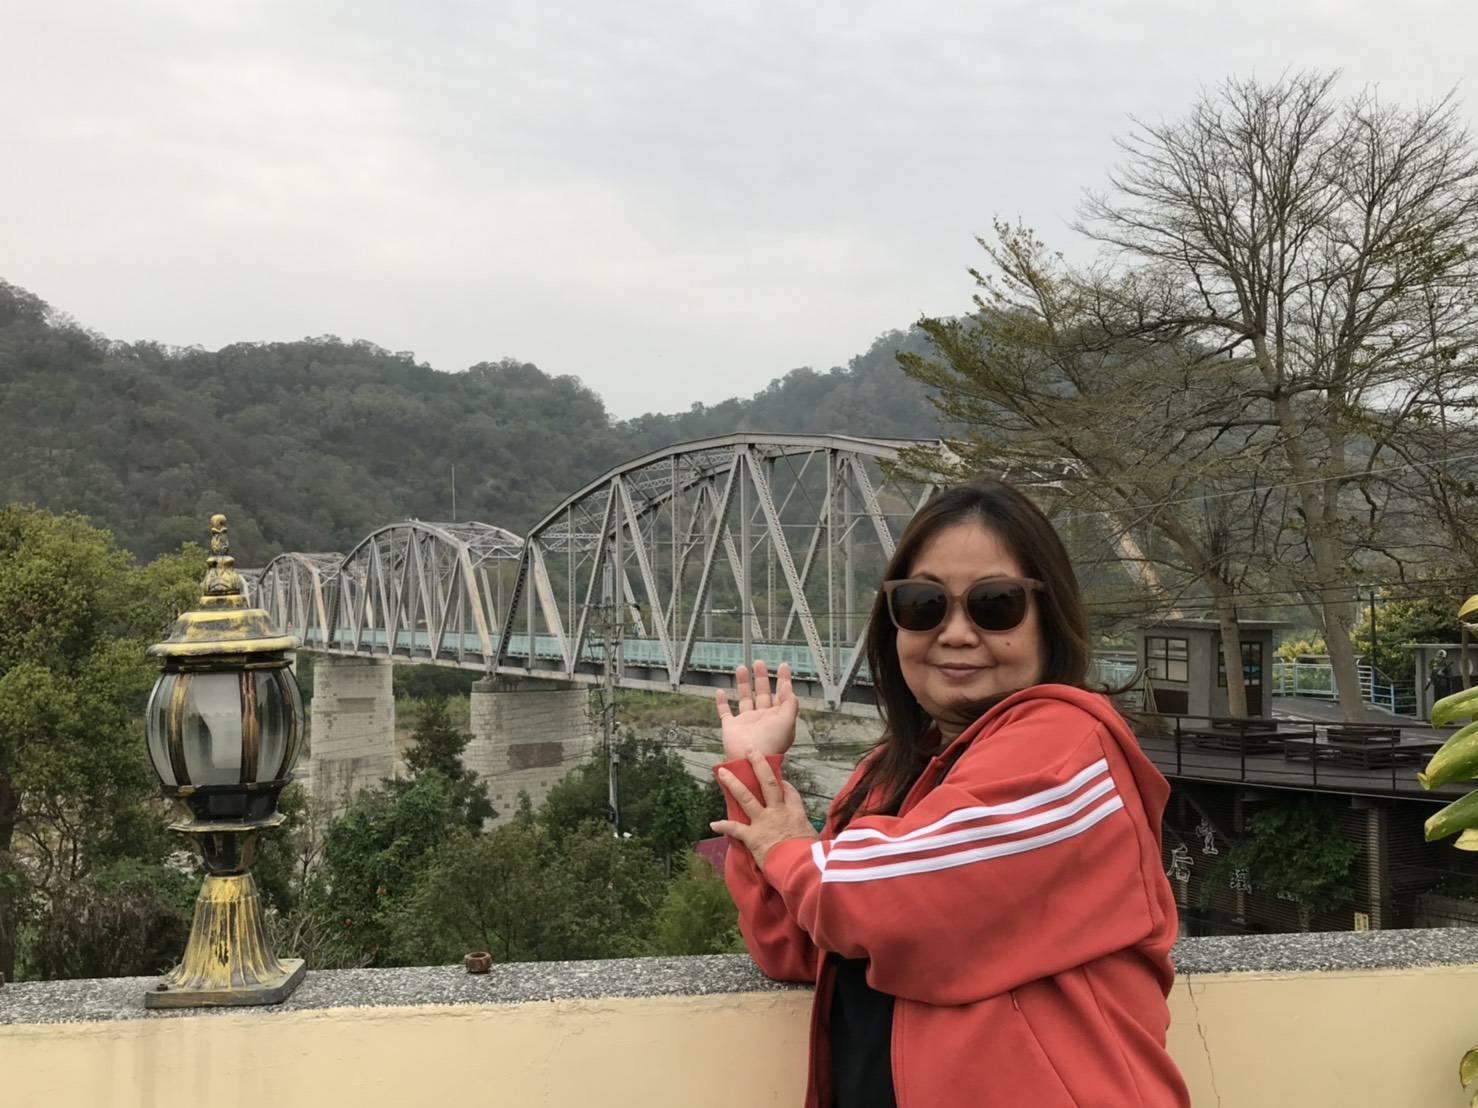 https://www.bounbang.com/blog/b6a8c8306137120b.jpg